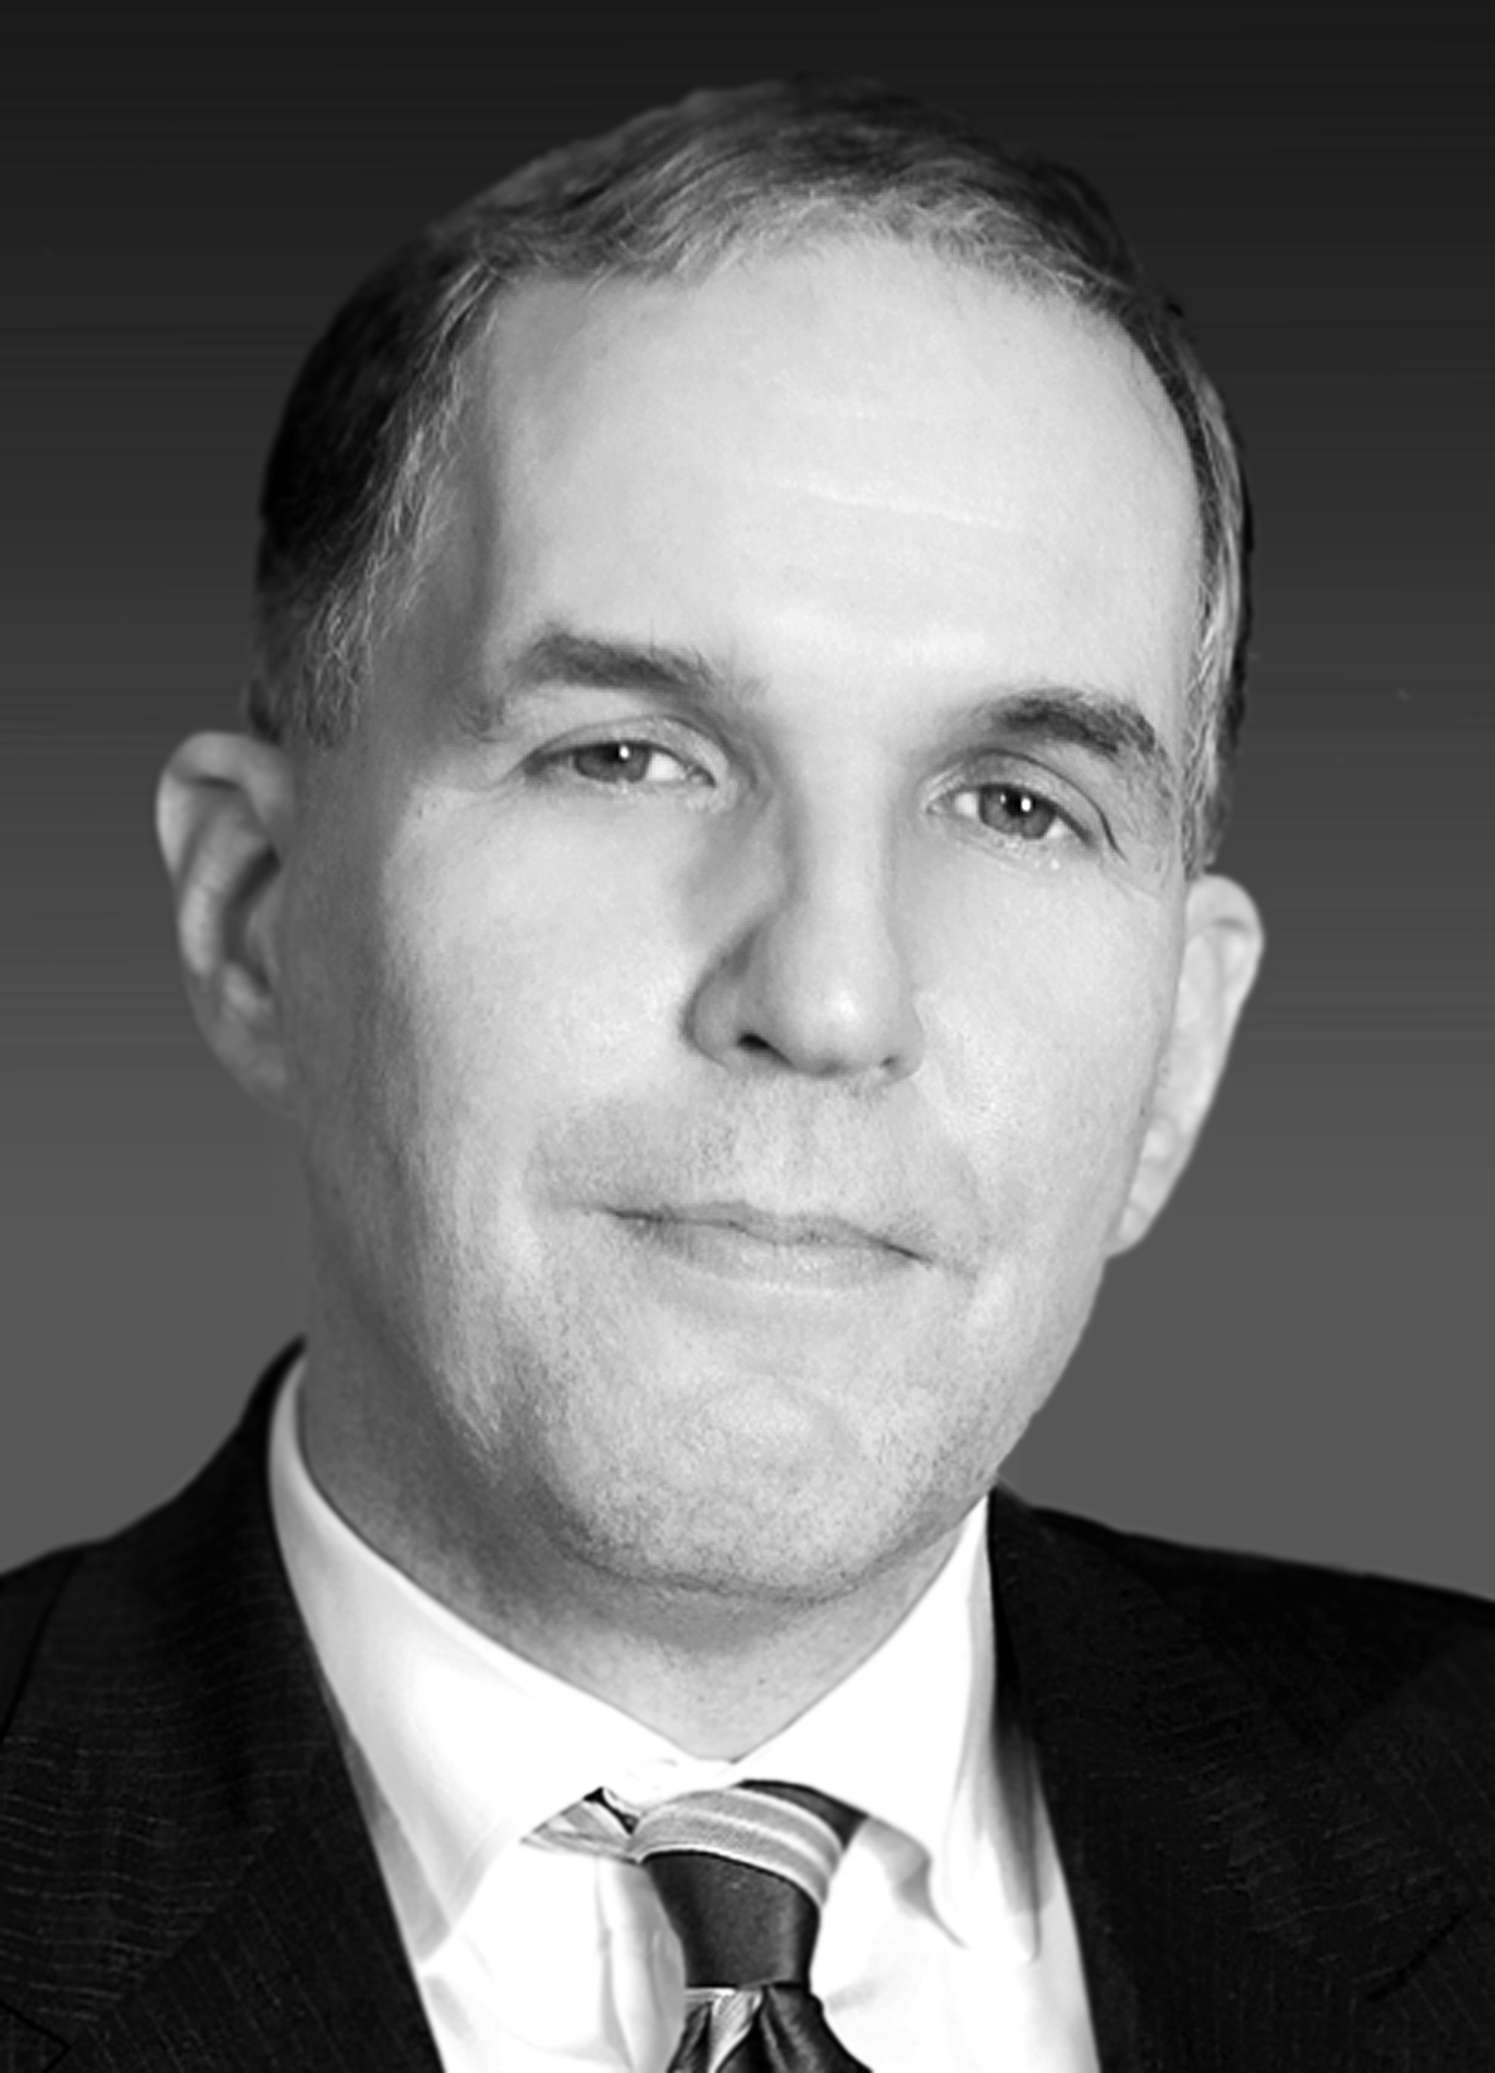 Burkhard Schwenker